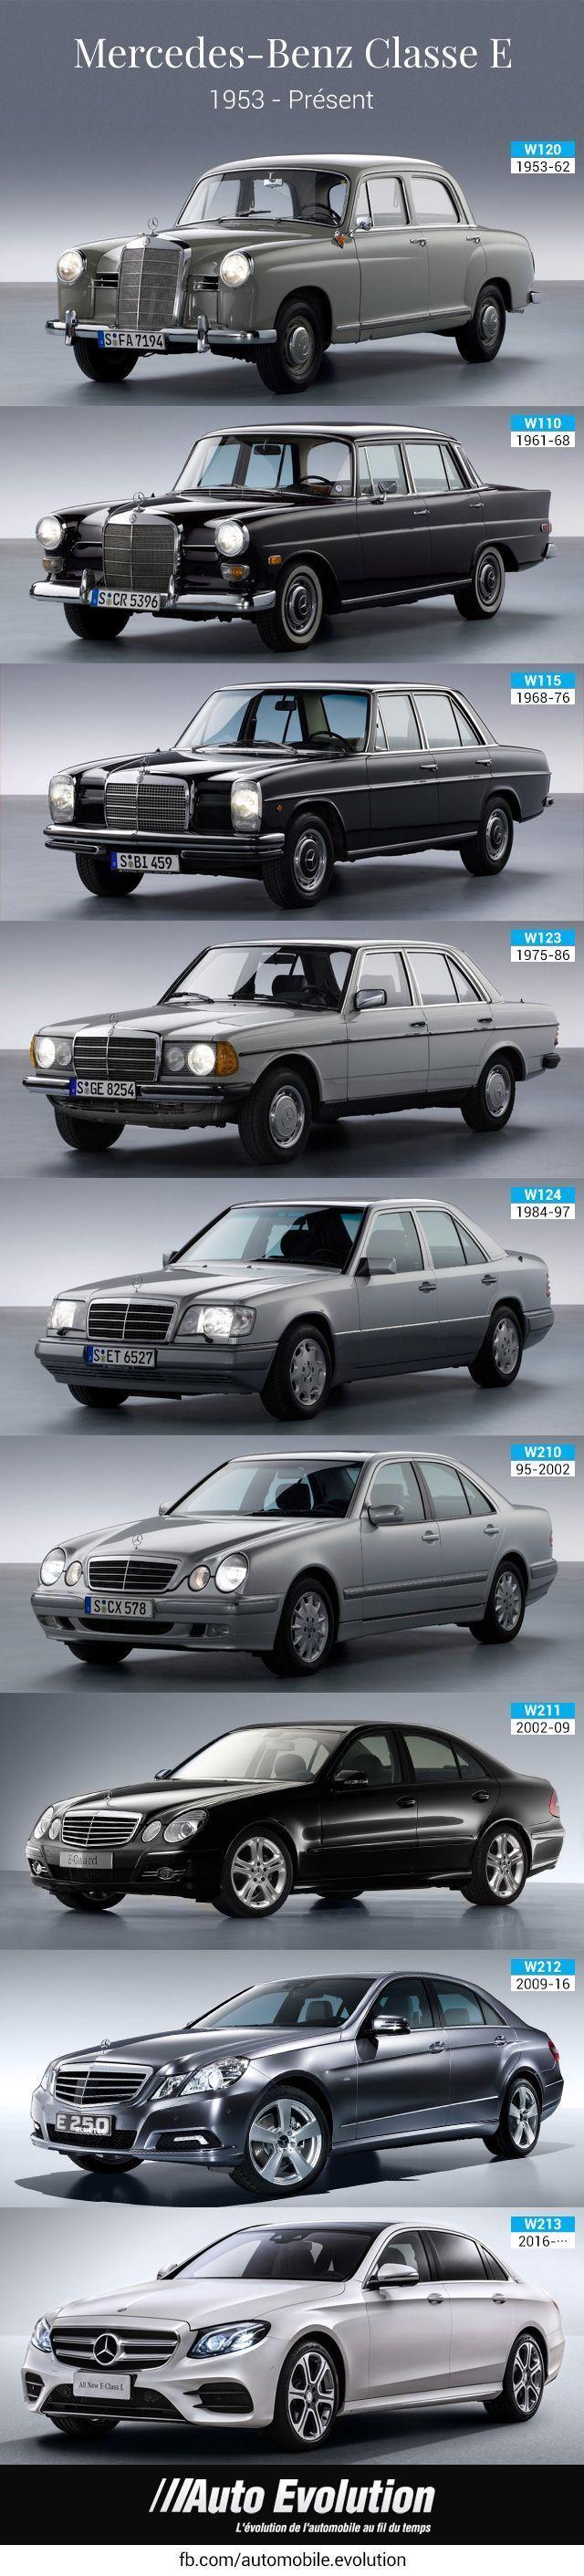 Mercedes Benz E class evolution History Mercedes Benz E Class - -